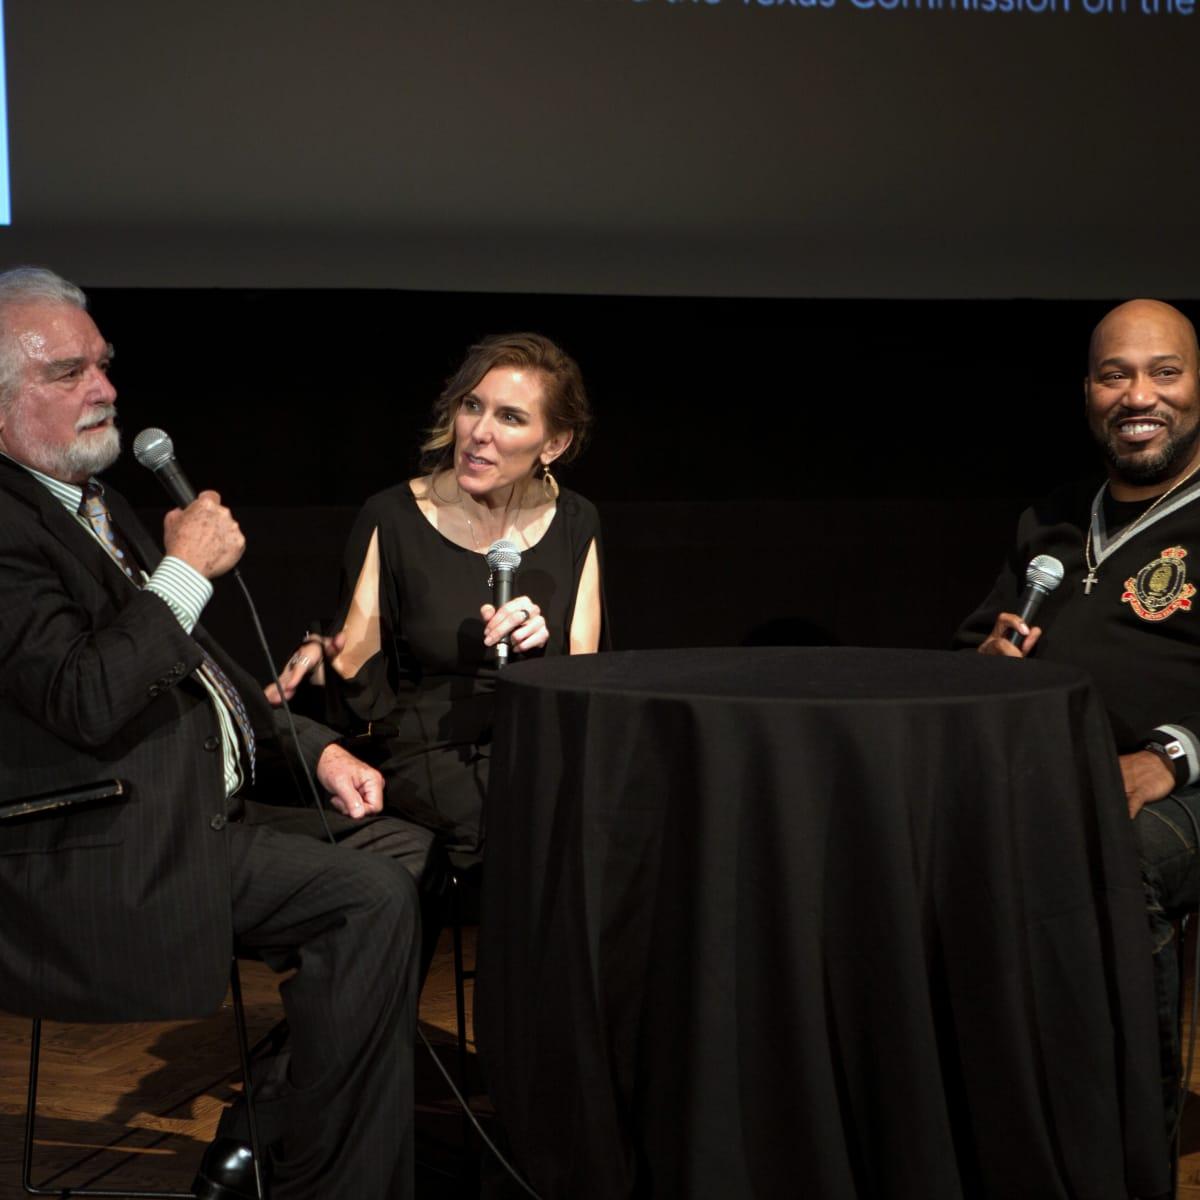 Houston, Cinema Arts Fest opening night, November 2015, Dave Moriarty, Amy Berg, Bun B